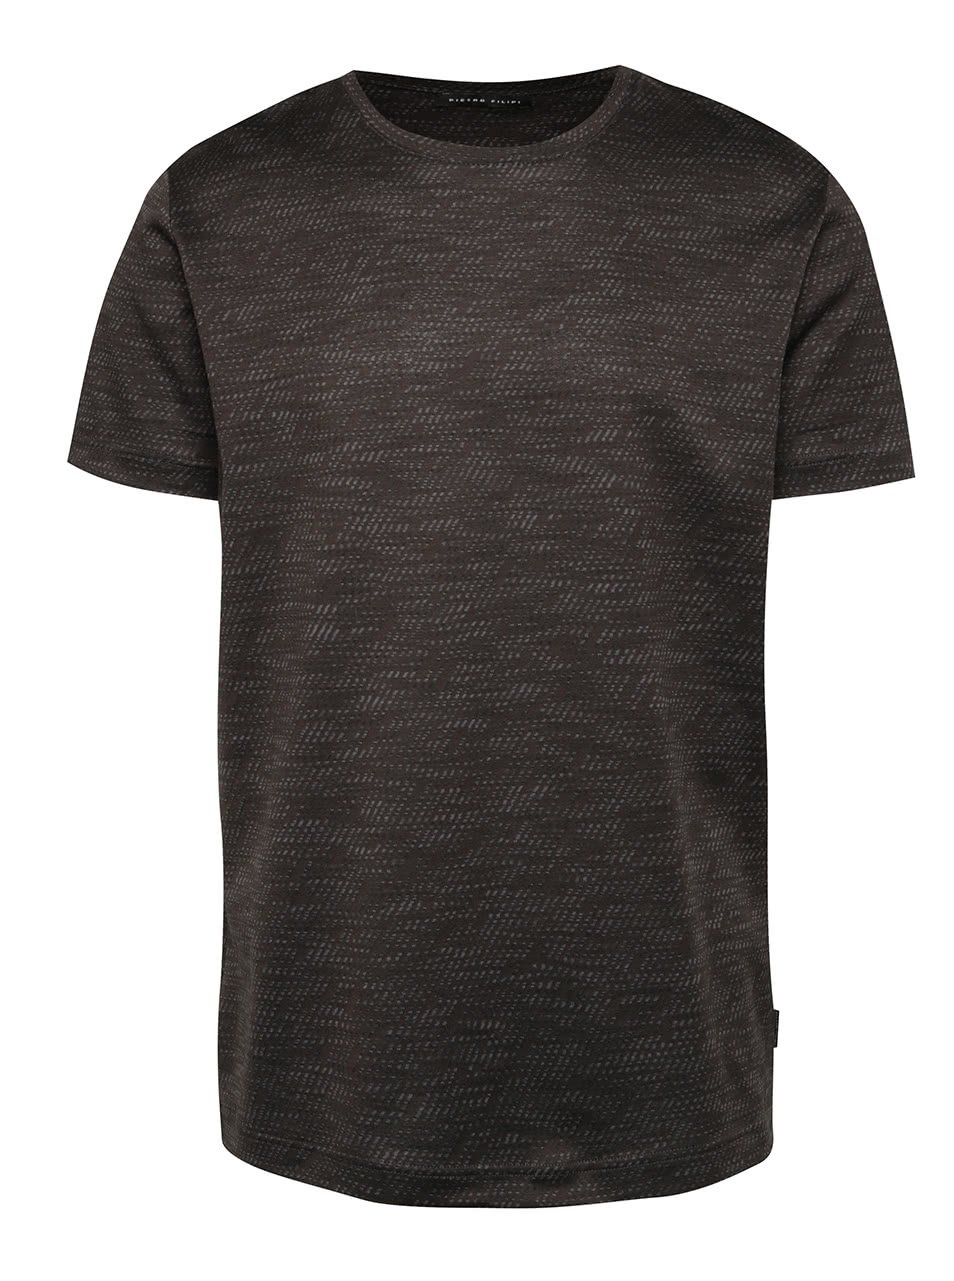 Tmavě šedé pánské žíhané triko s krátkým rukávem Pietro Filipi